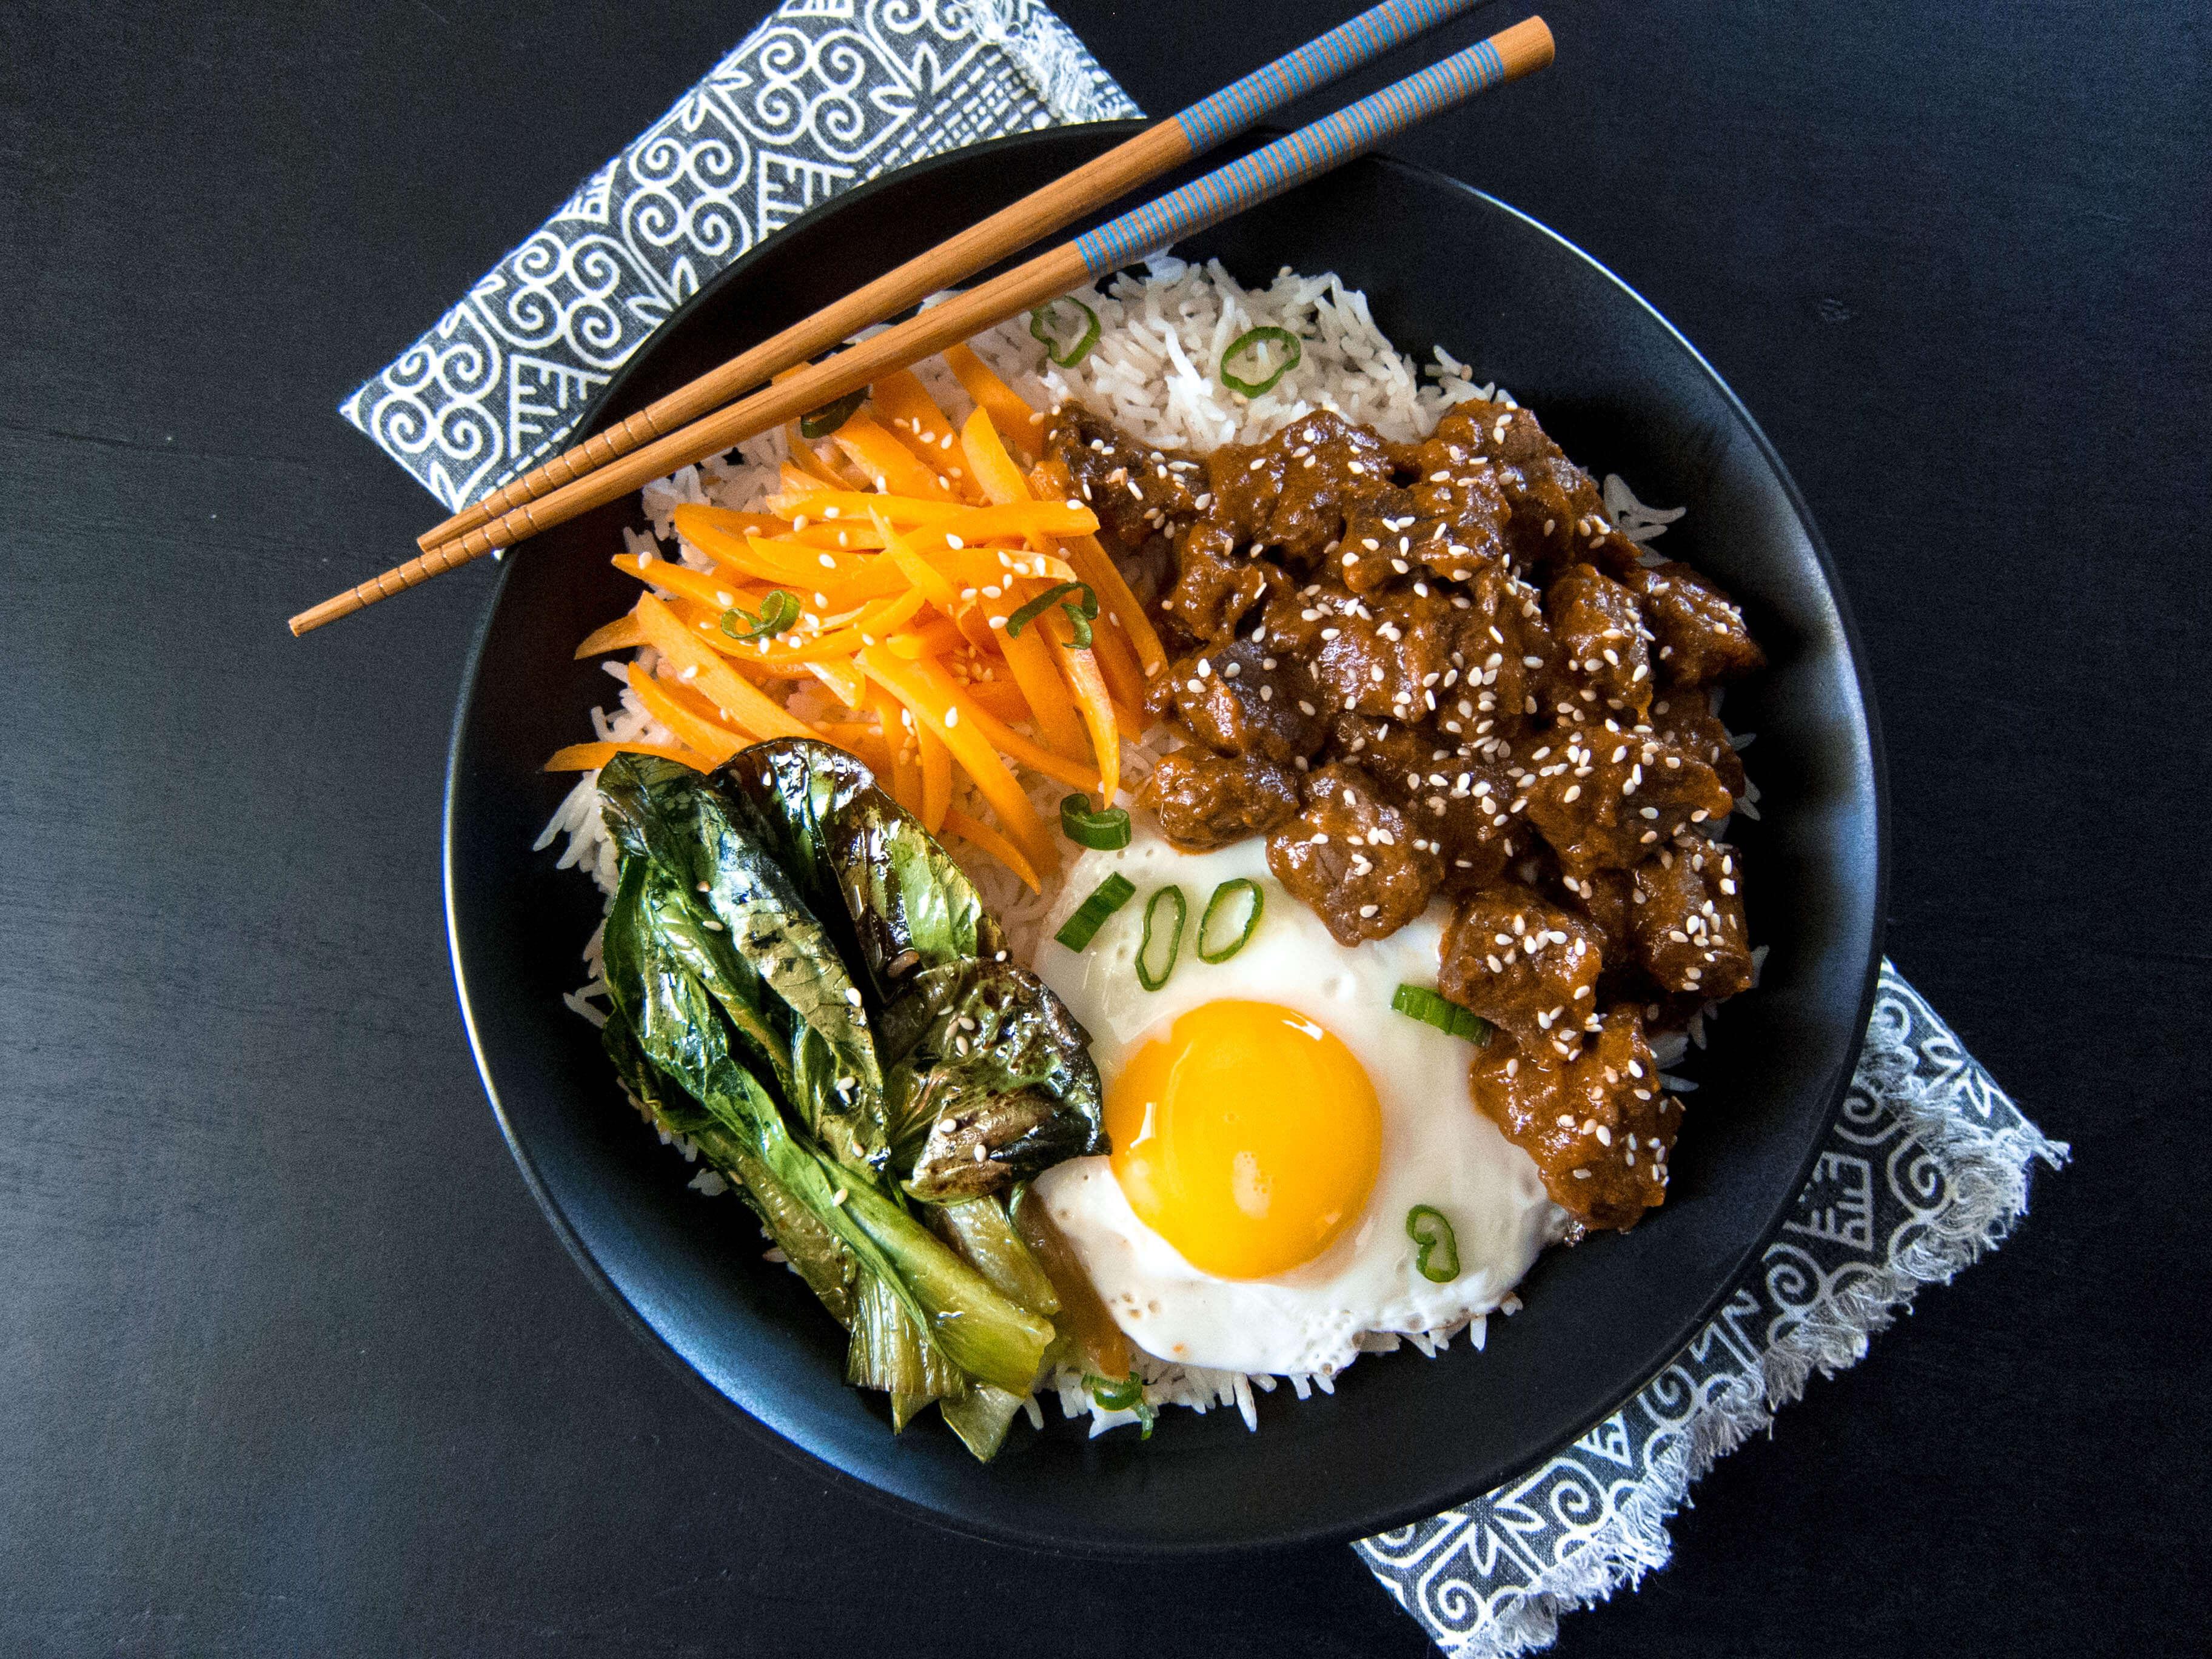 Bibimbap arroz con cosas coreano que mola mil!